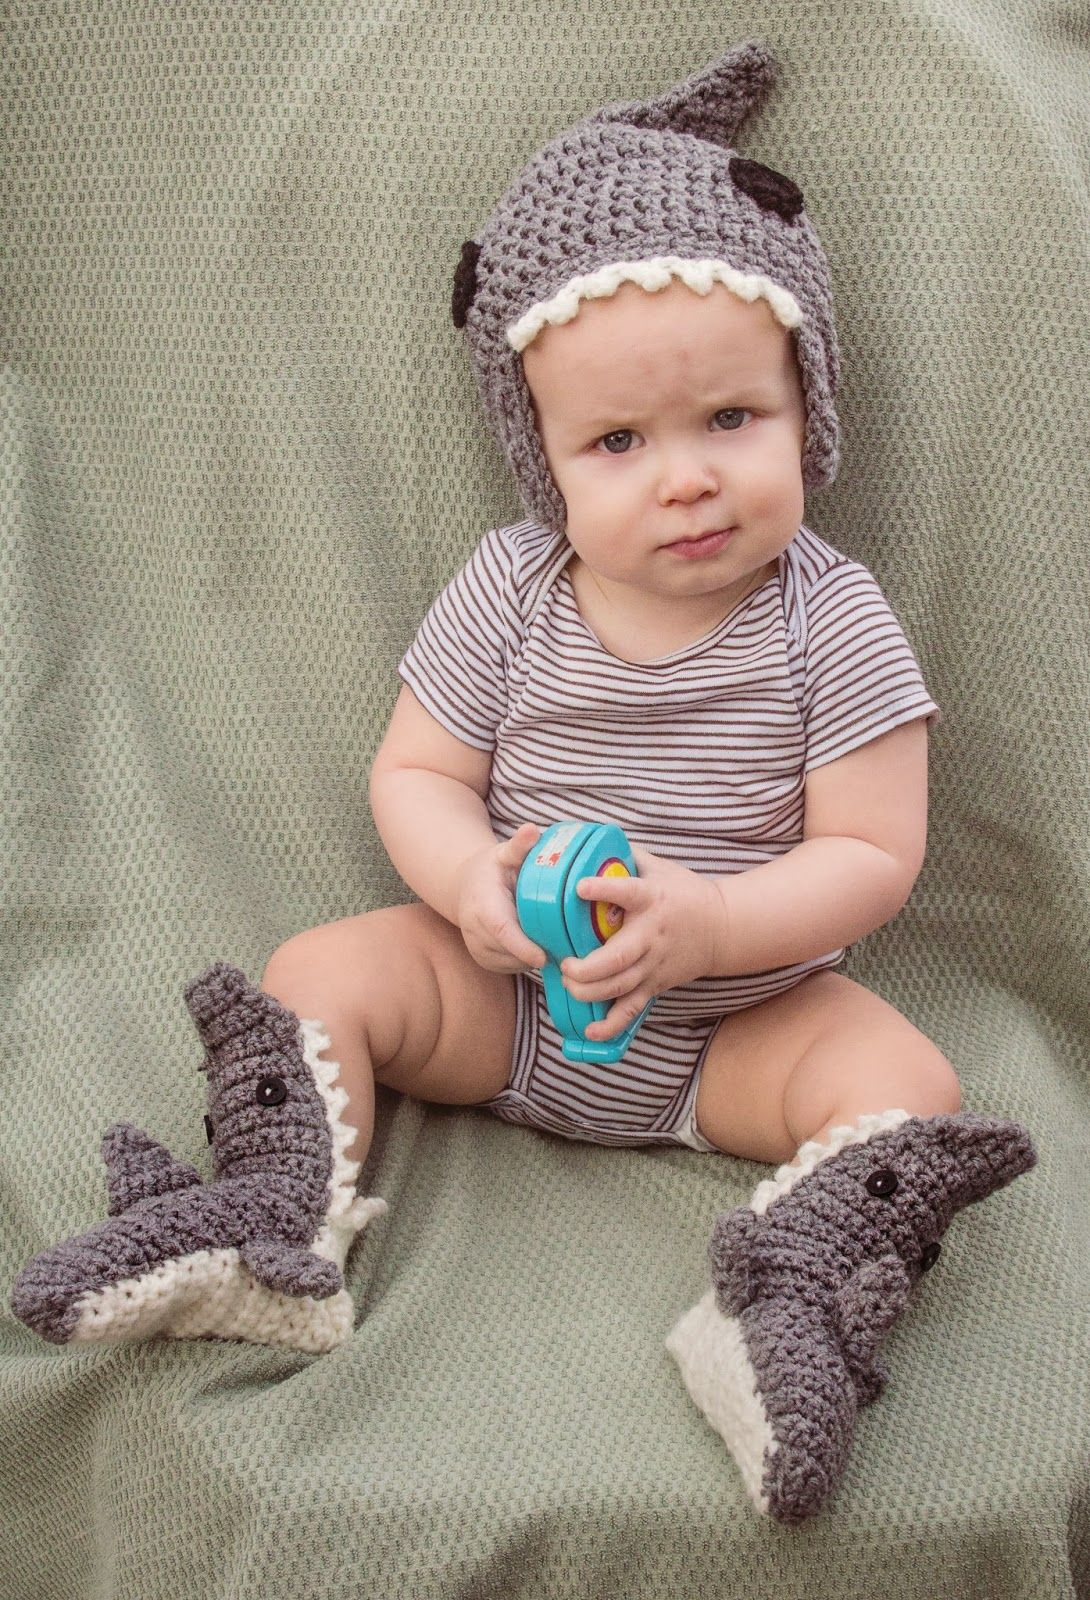 Tubarão | Crochê para bebê | Pinterest | Hauben, Häckeln und Nähideen